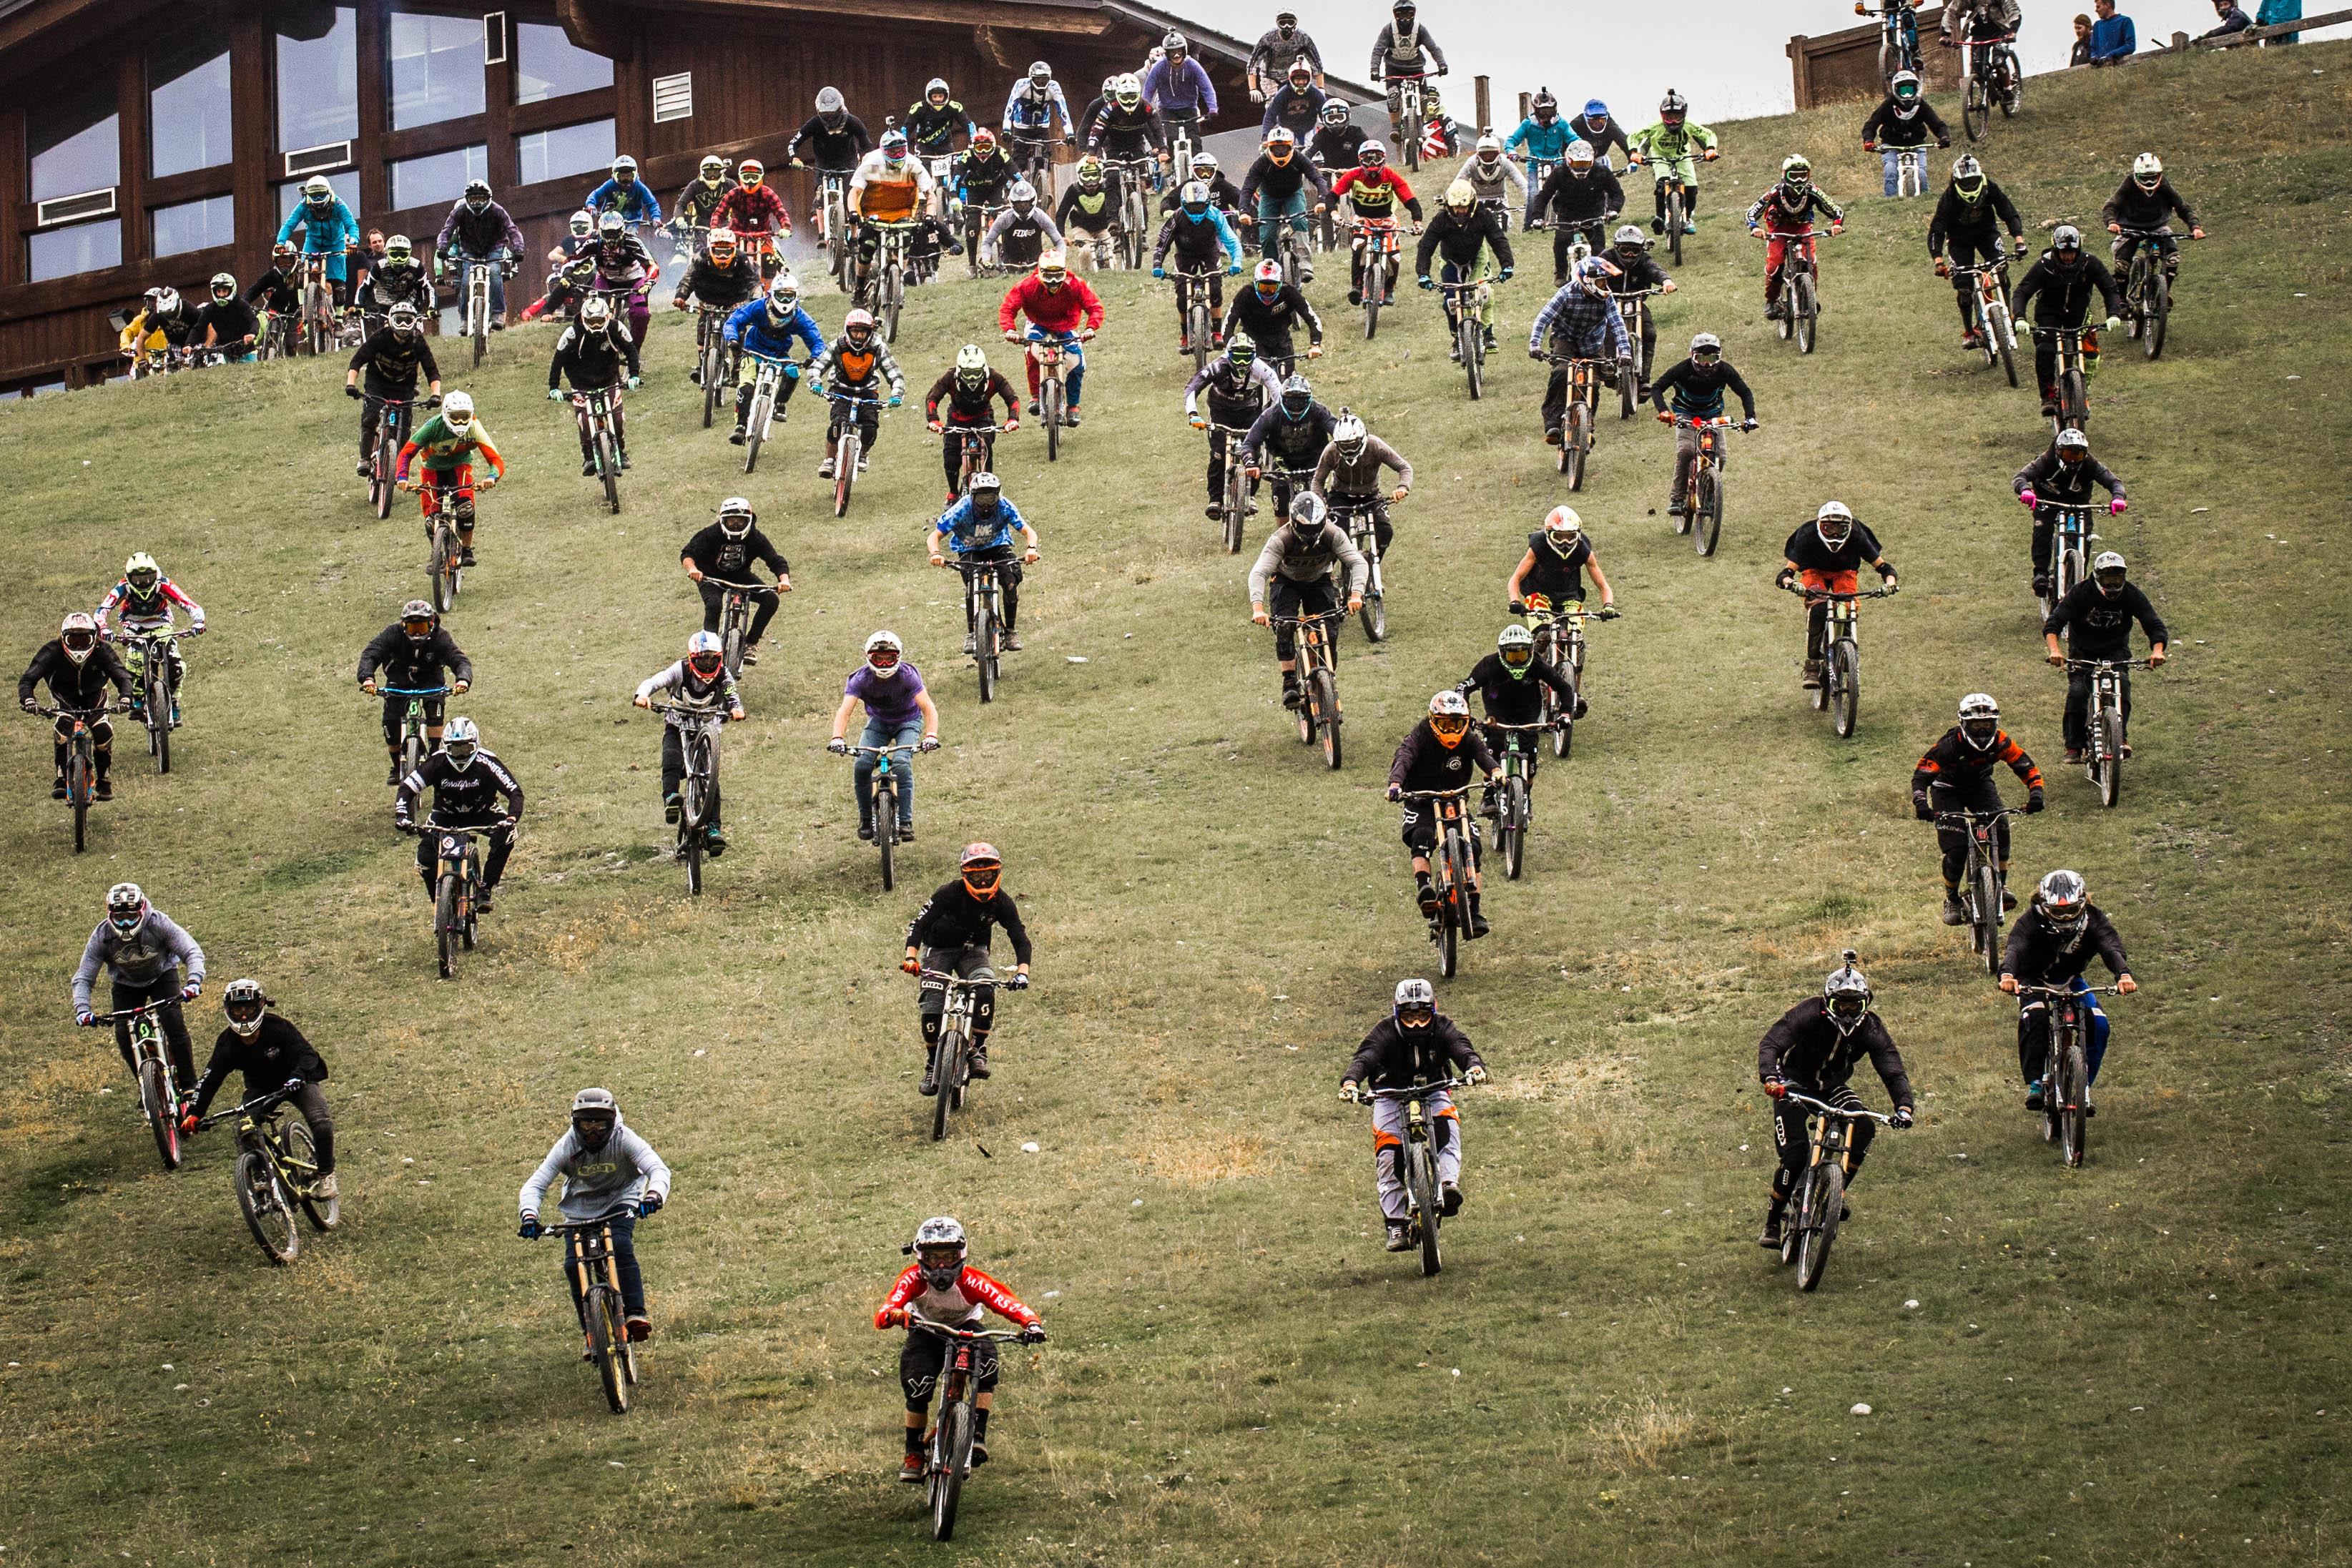 Riders esperti allo CPGANG partyRIDE weekend